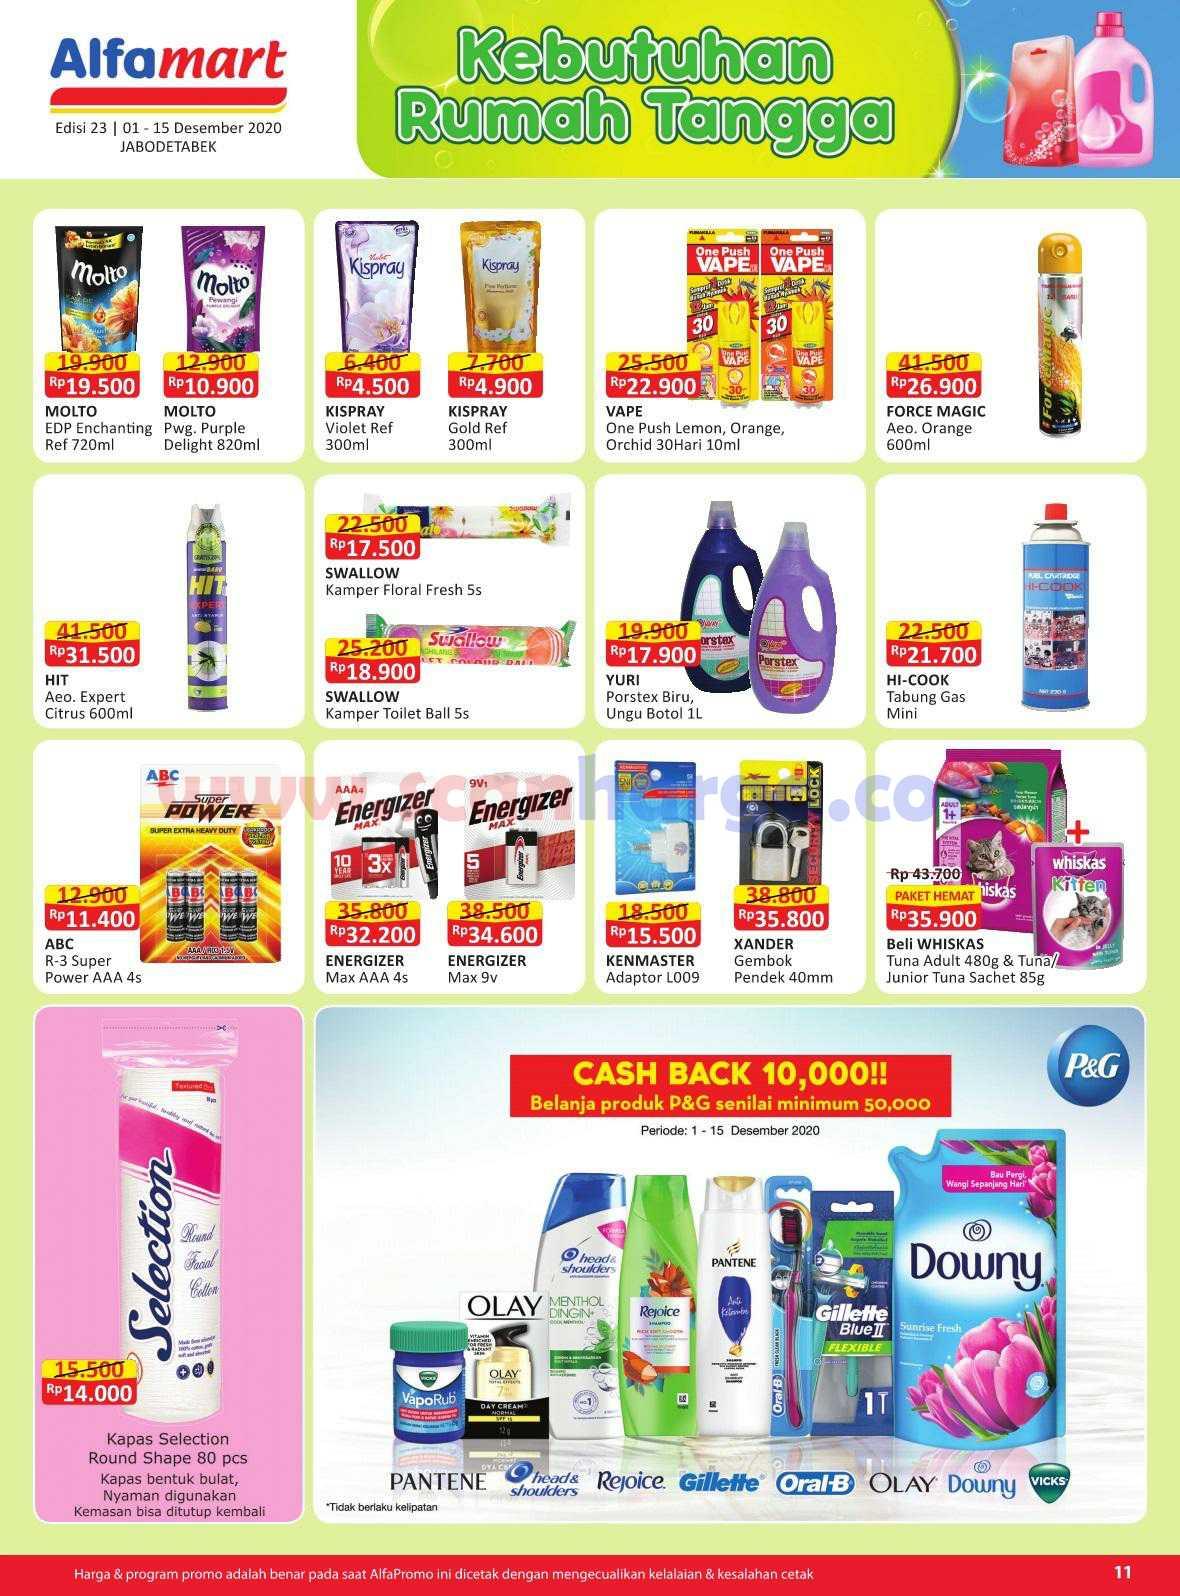 Katalog Promo Alfamart 1 - 15 Desember 2020 11